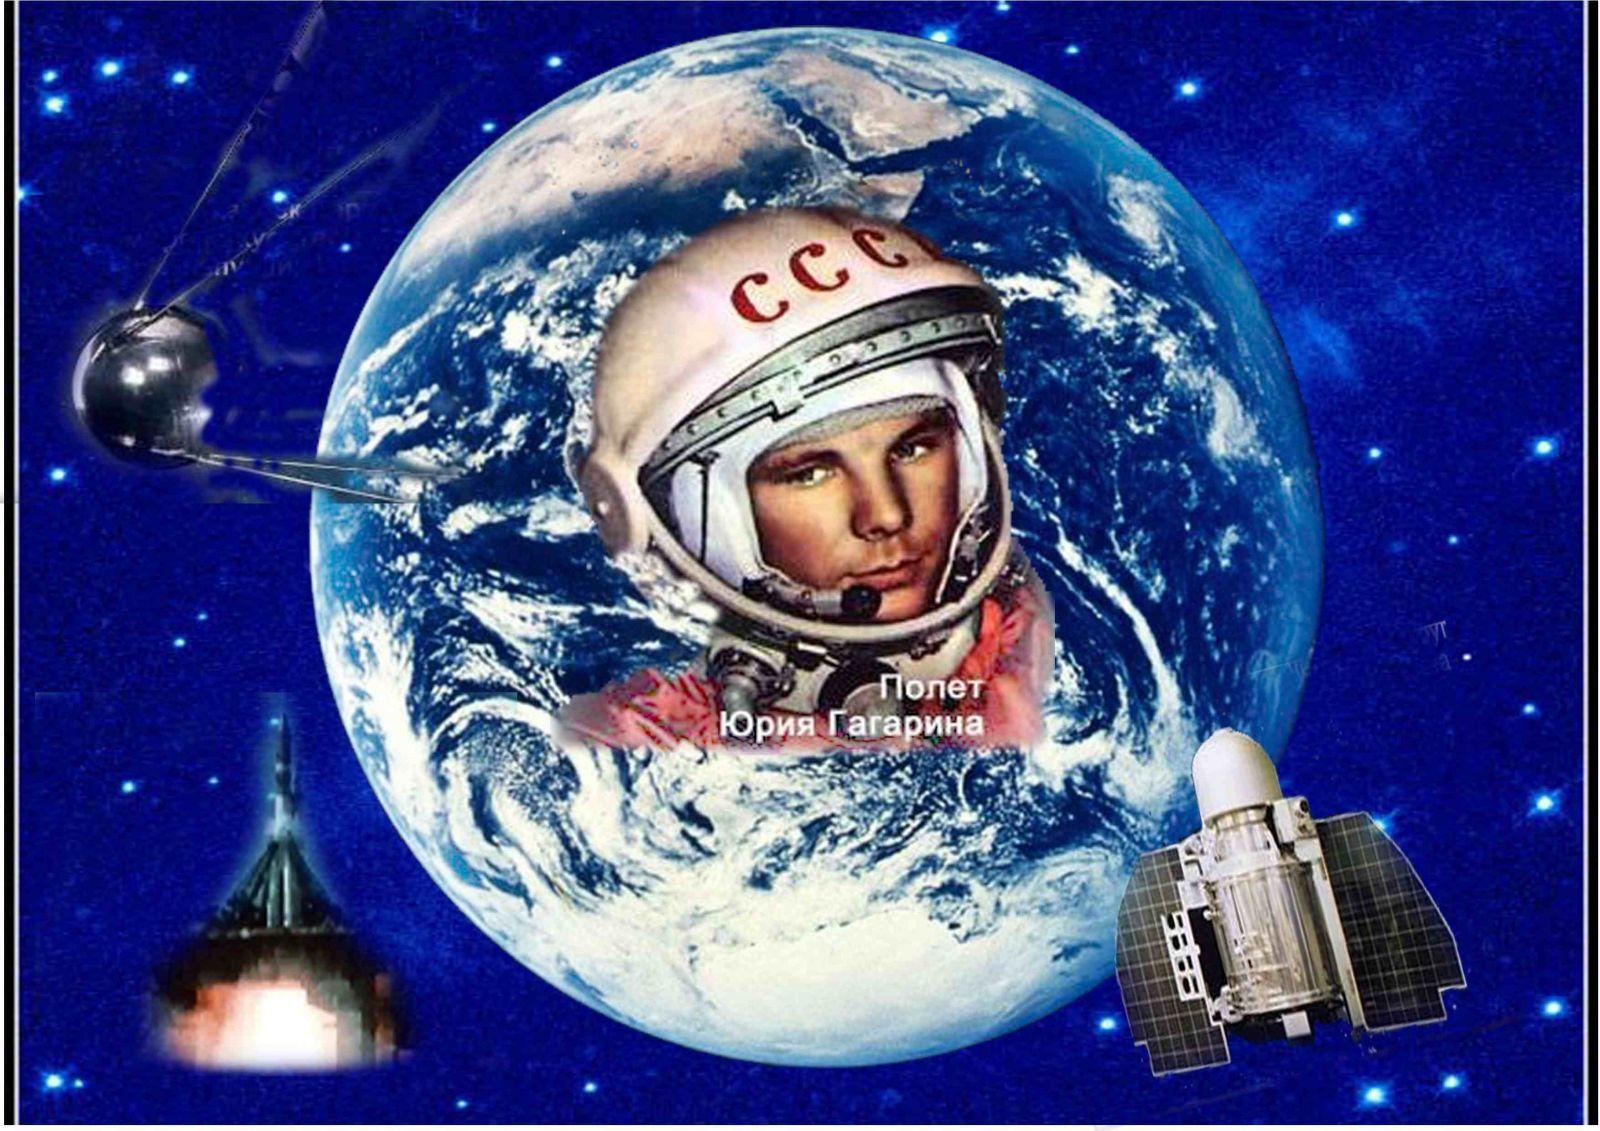 космонавт 3.jpg